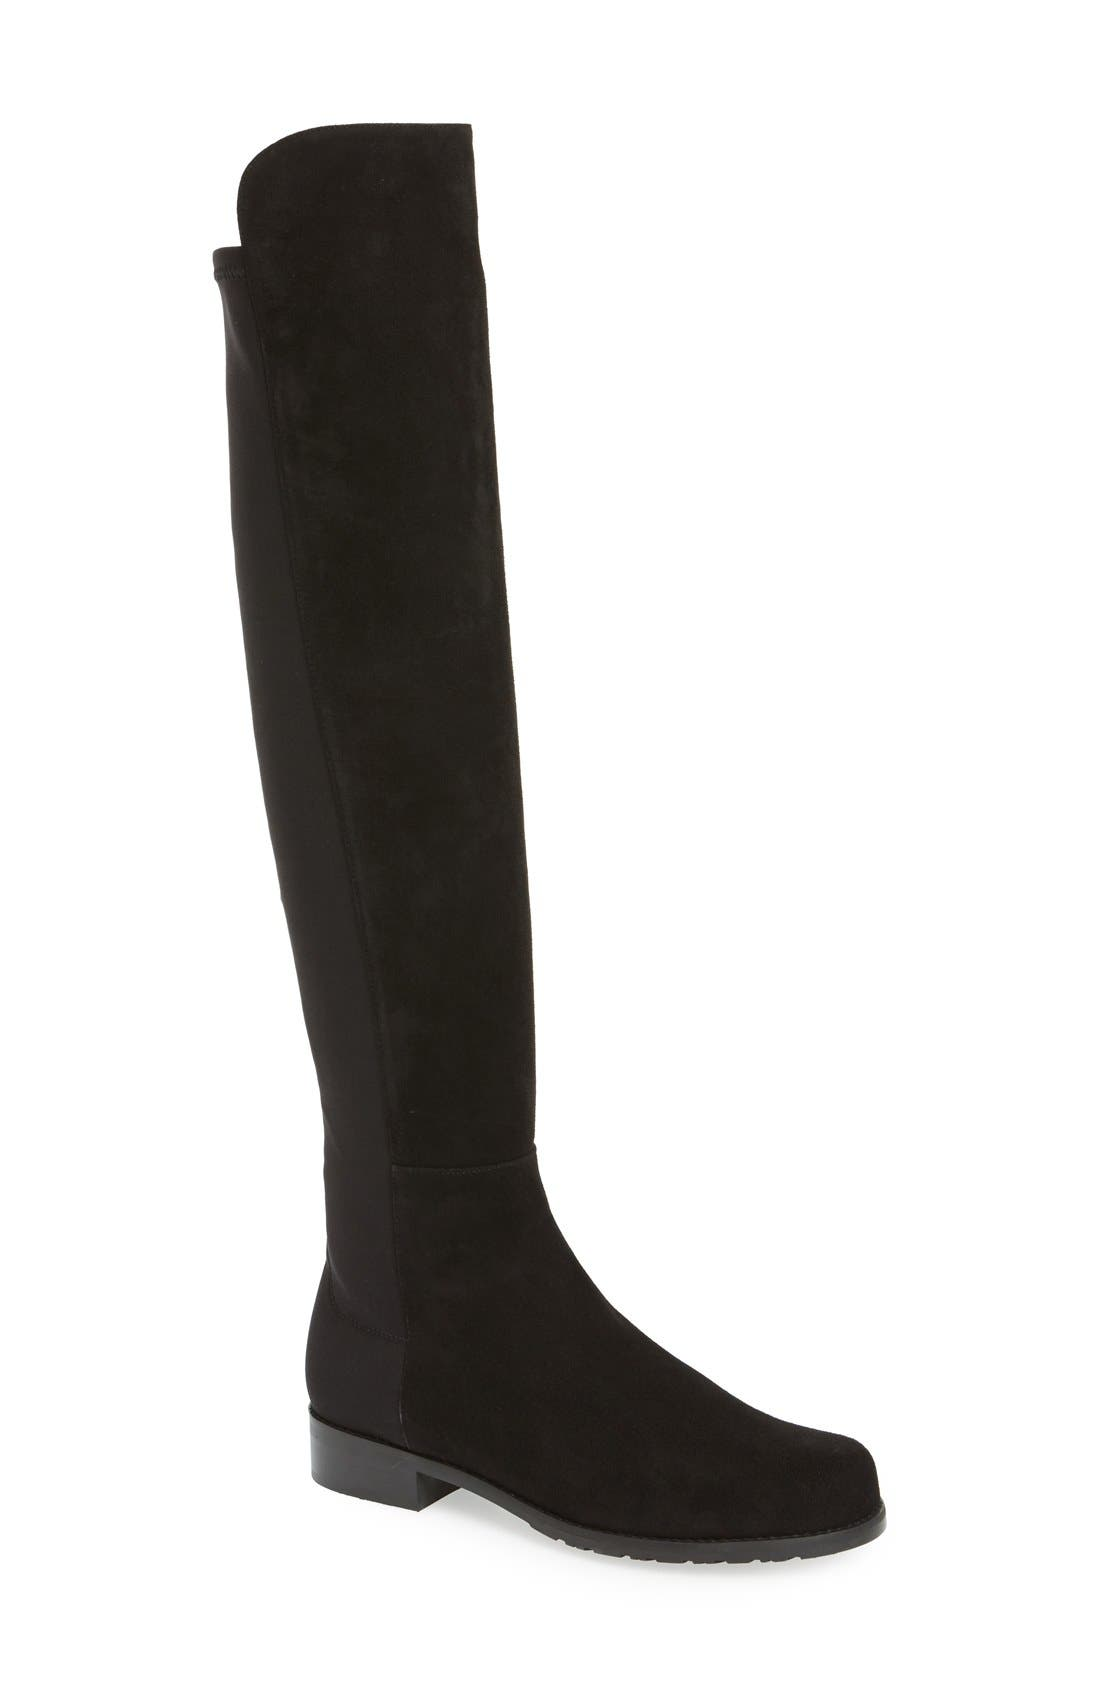 Stuart Weitzman 5050 Over The Knee Leather Boot- Black